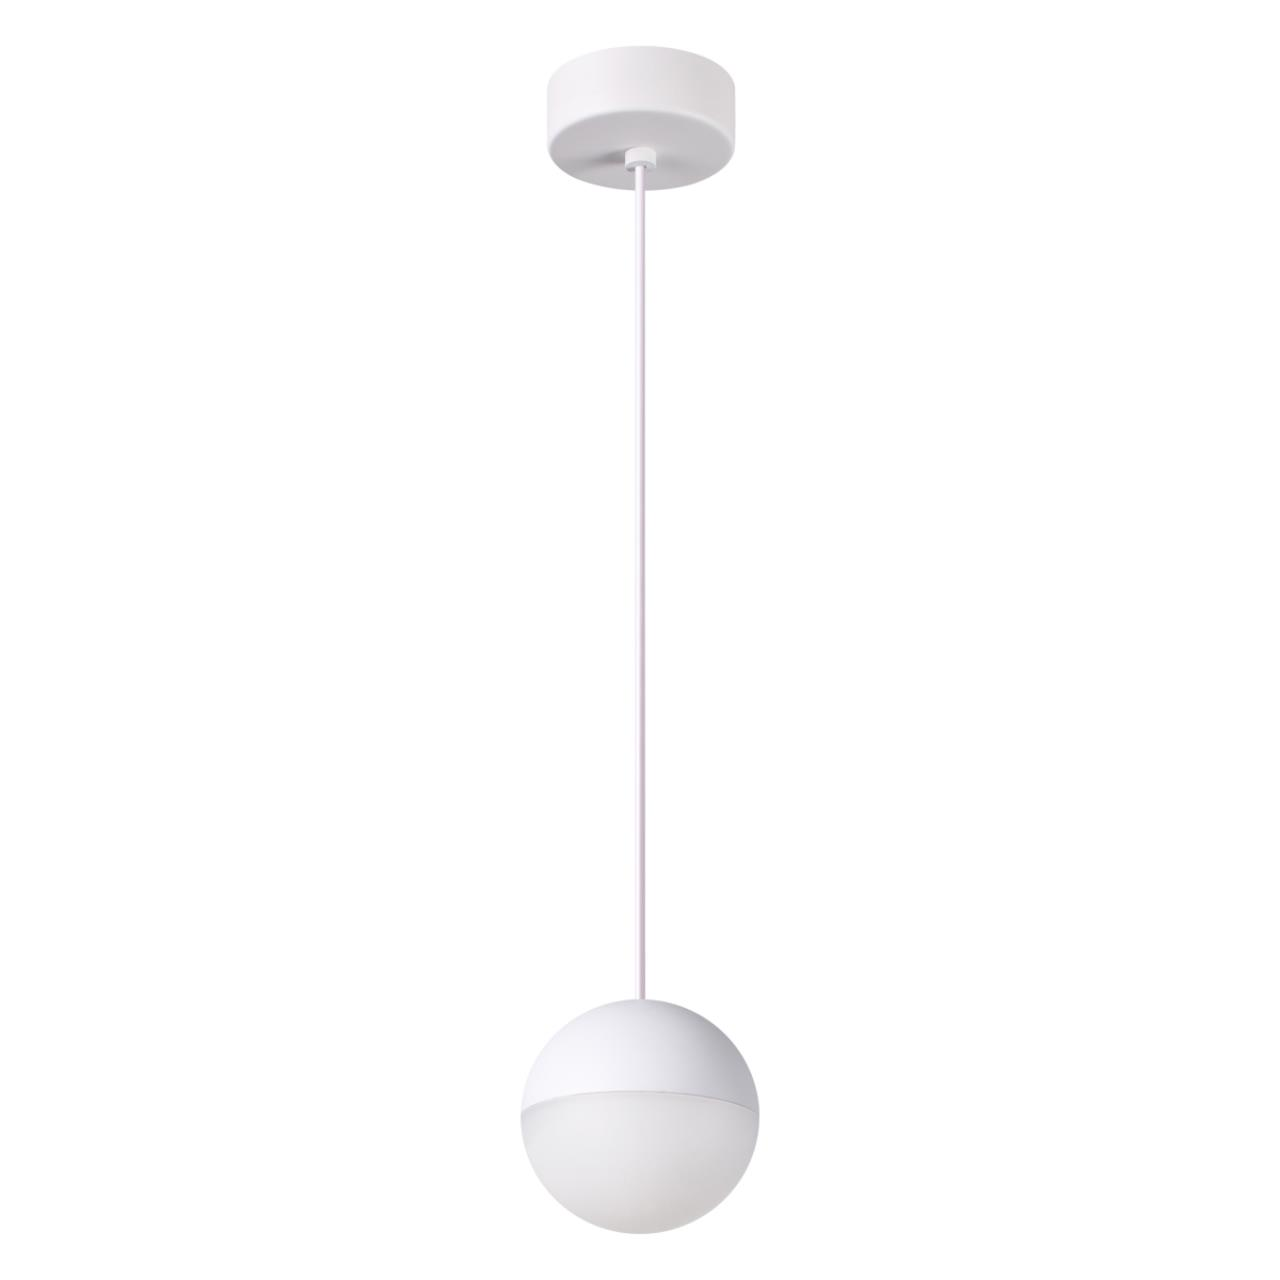 357942 OVER NT19 024 белый Накладной светильник IP20 LED 3000К 8W 220-240V BALL